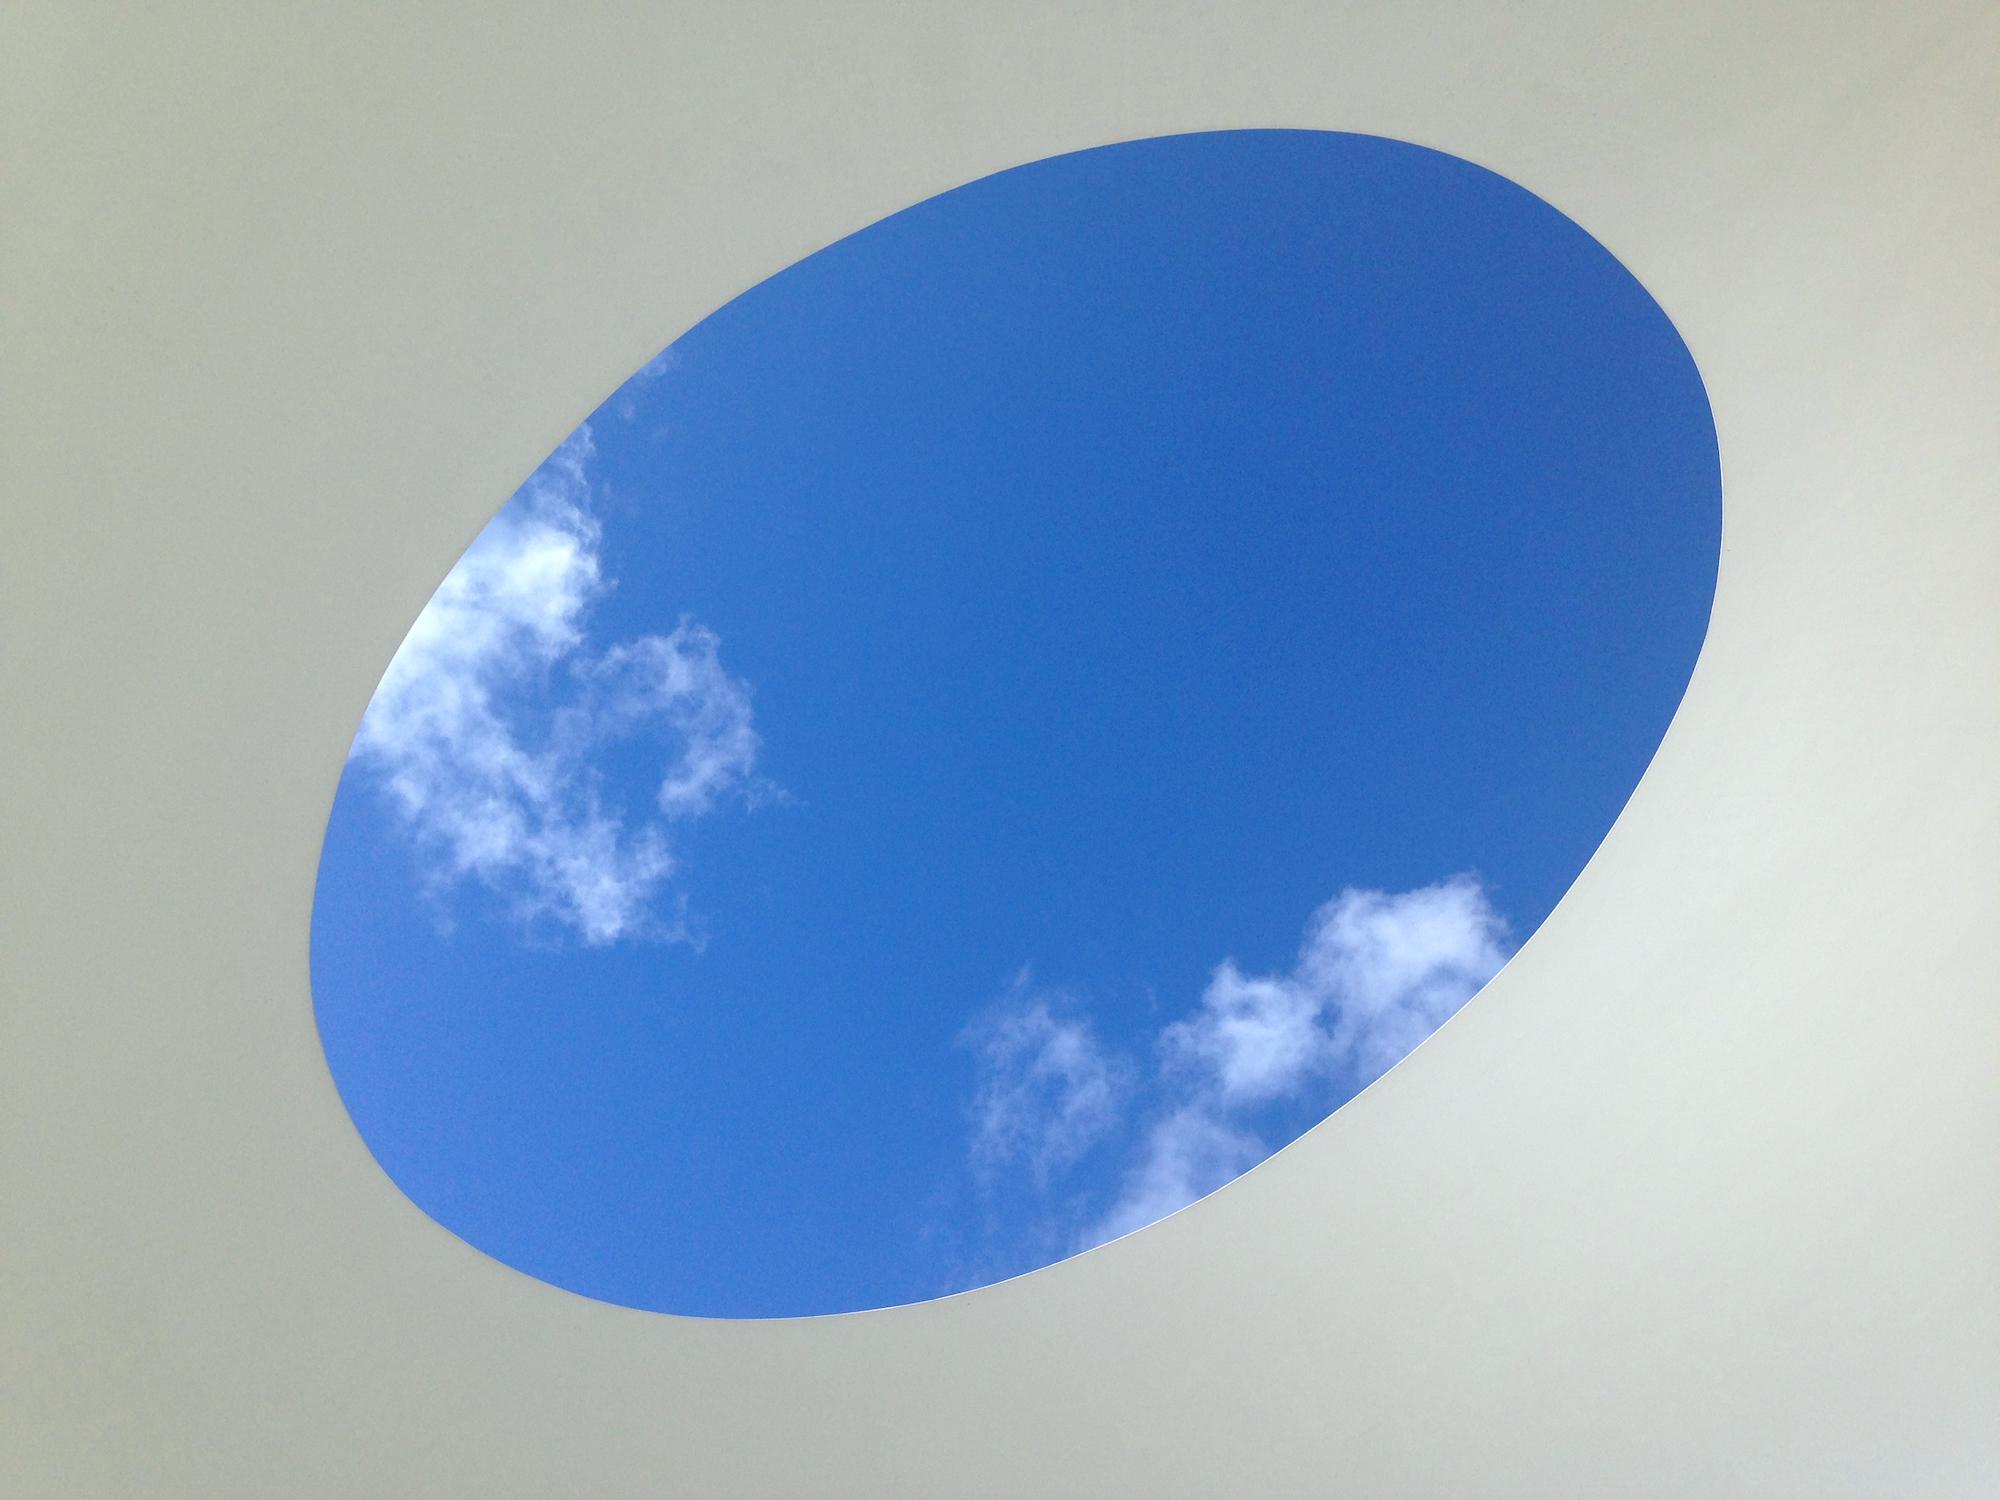 eleanor-bell-light-art-james-turrell-skyspace-tremenheere.jpg